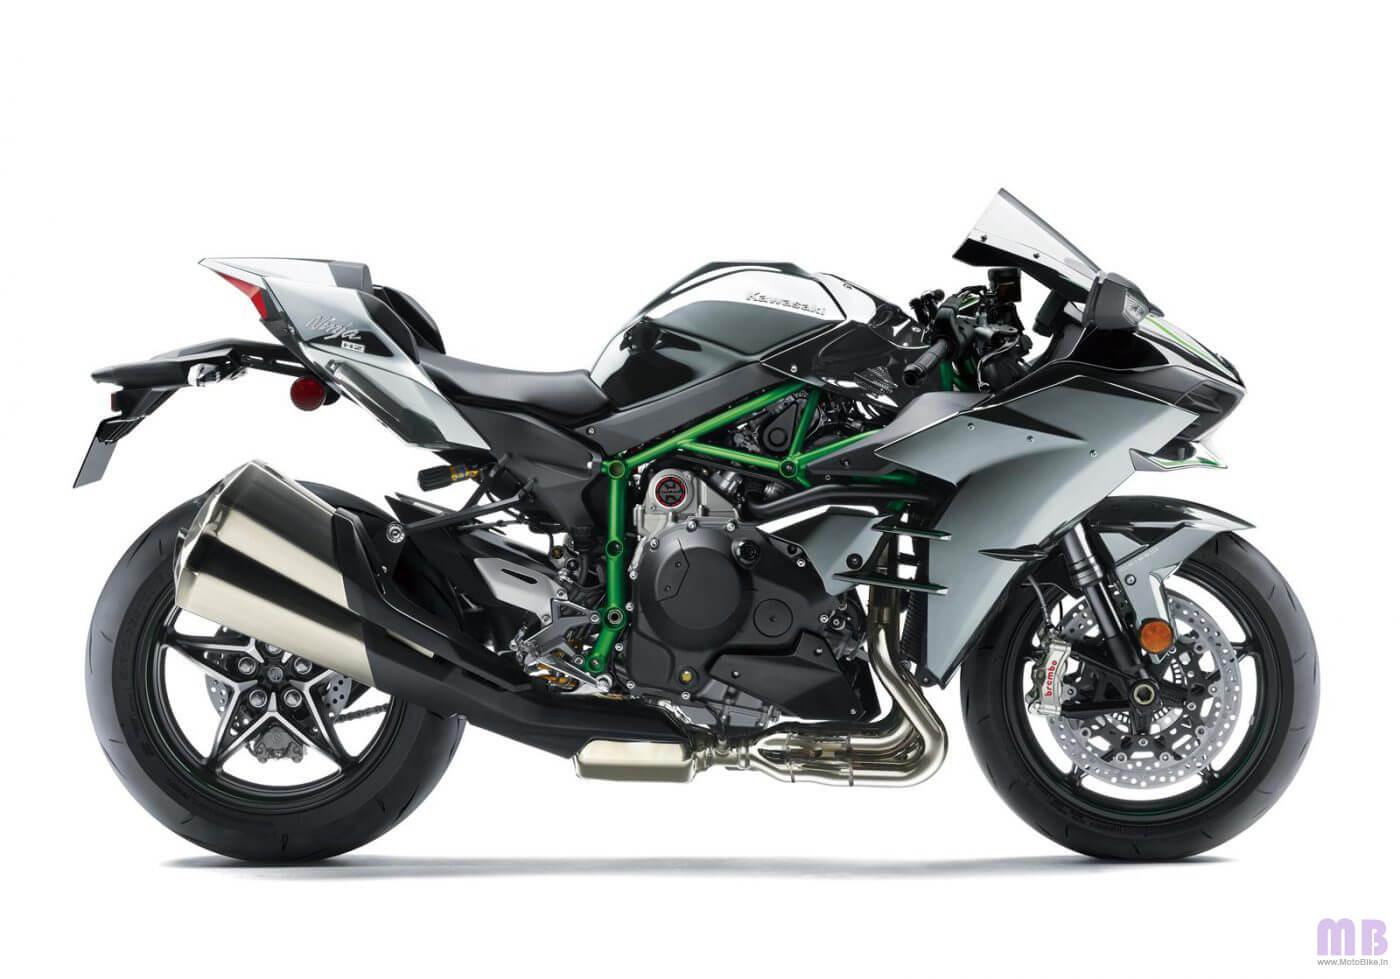 Kawasaki Ninja H2 - Mirror Coated Spark Black